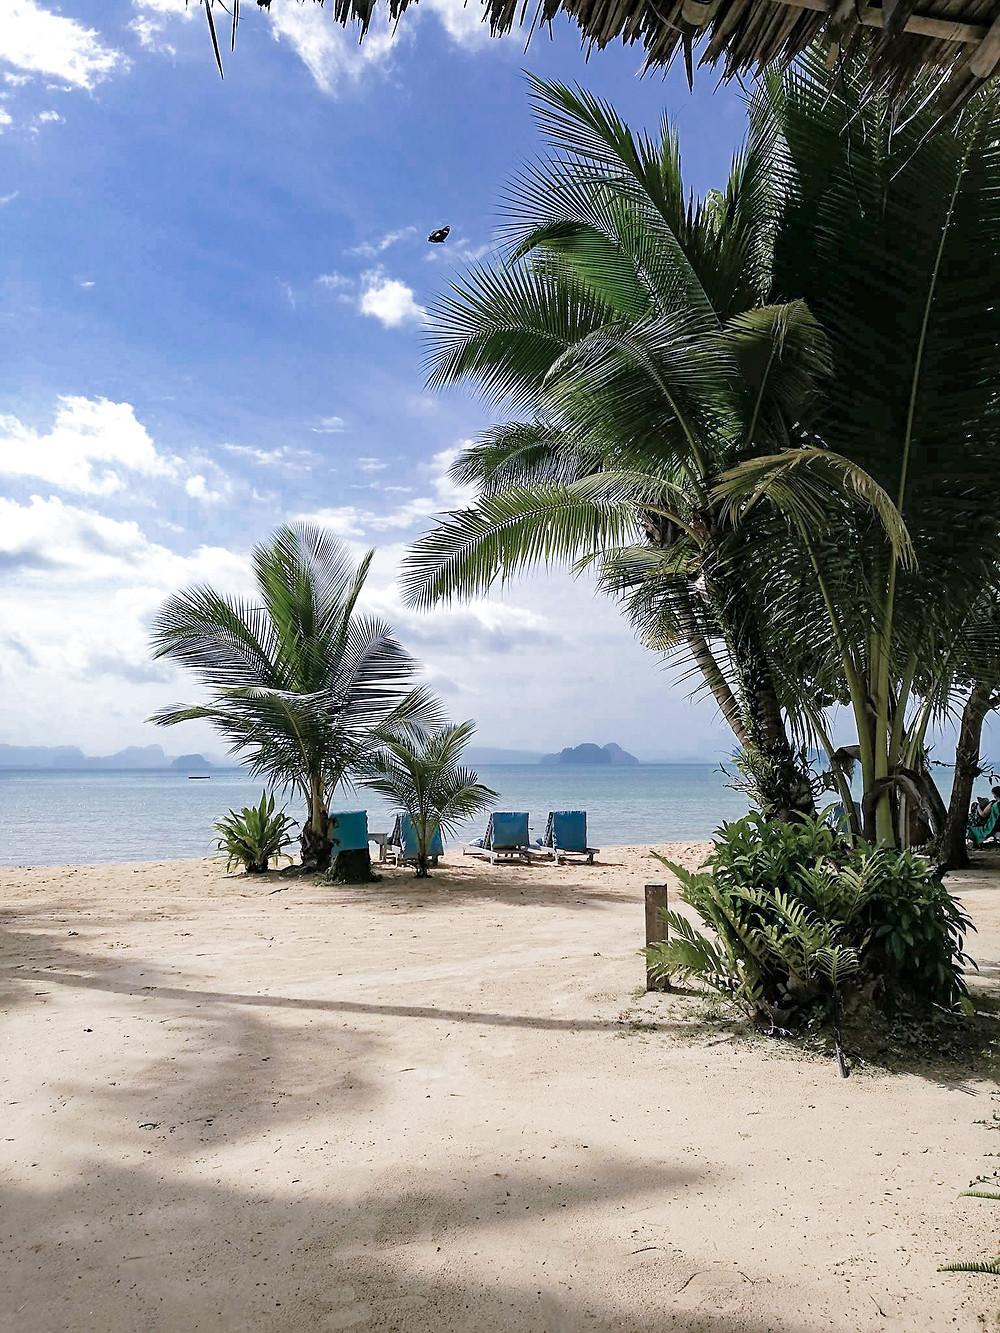 Plage de Koh Yao Noi depuis le resort Paradise Koh Yao